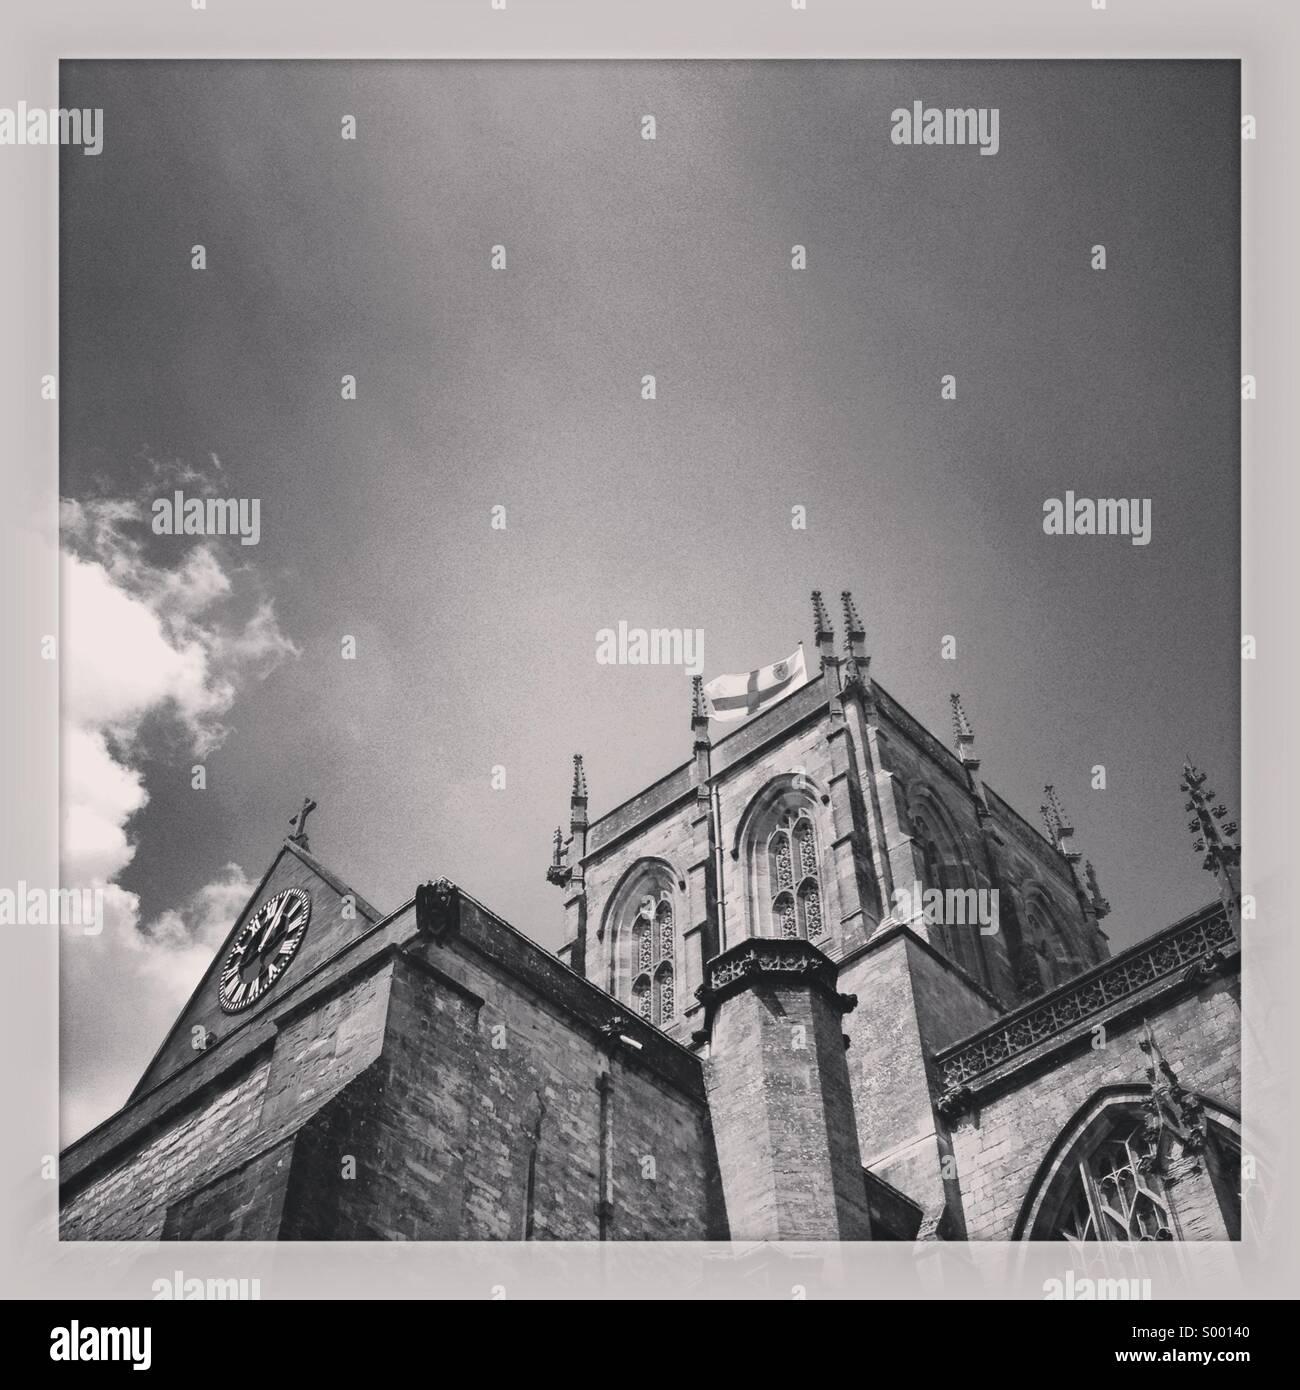 Light shining on church roof, Sherborne, England - Stock Image